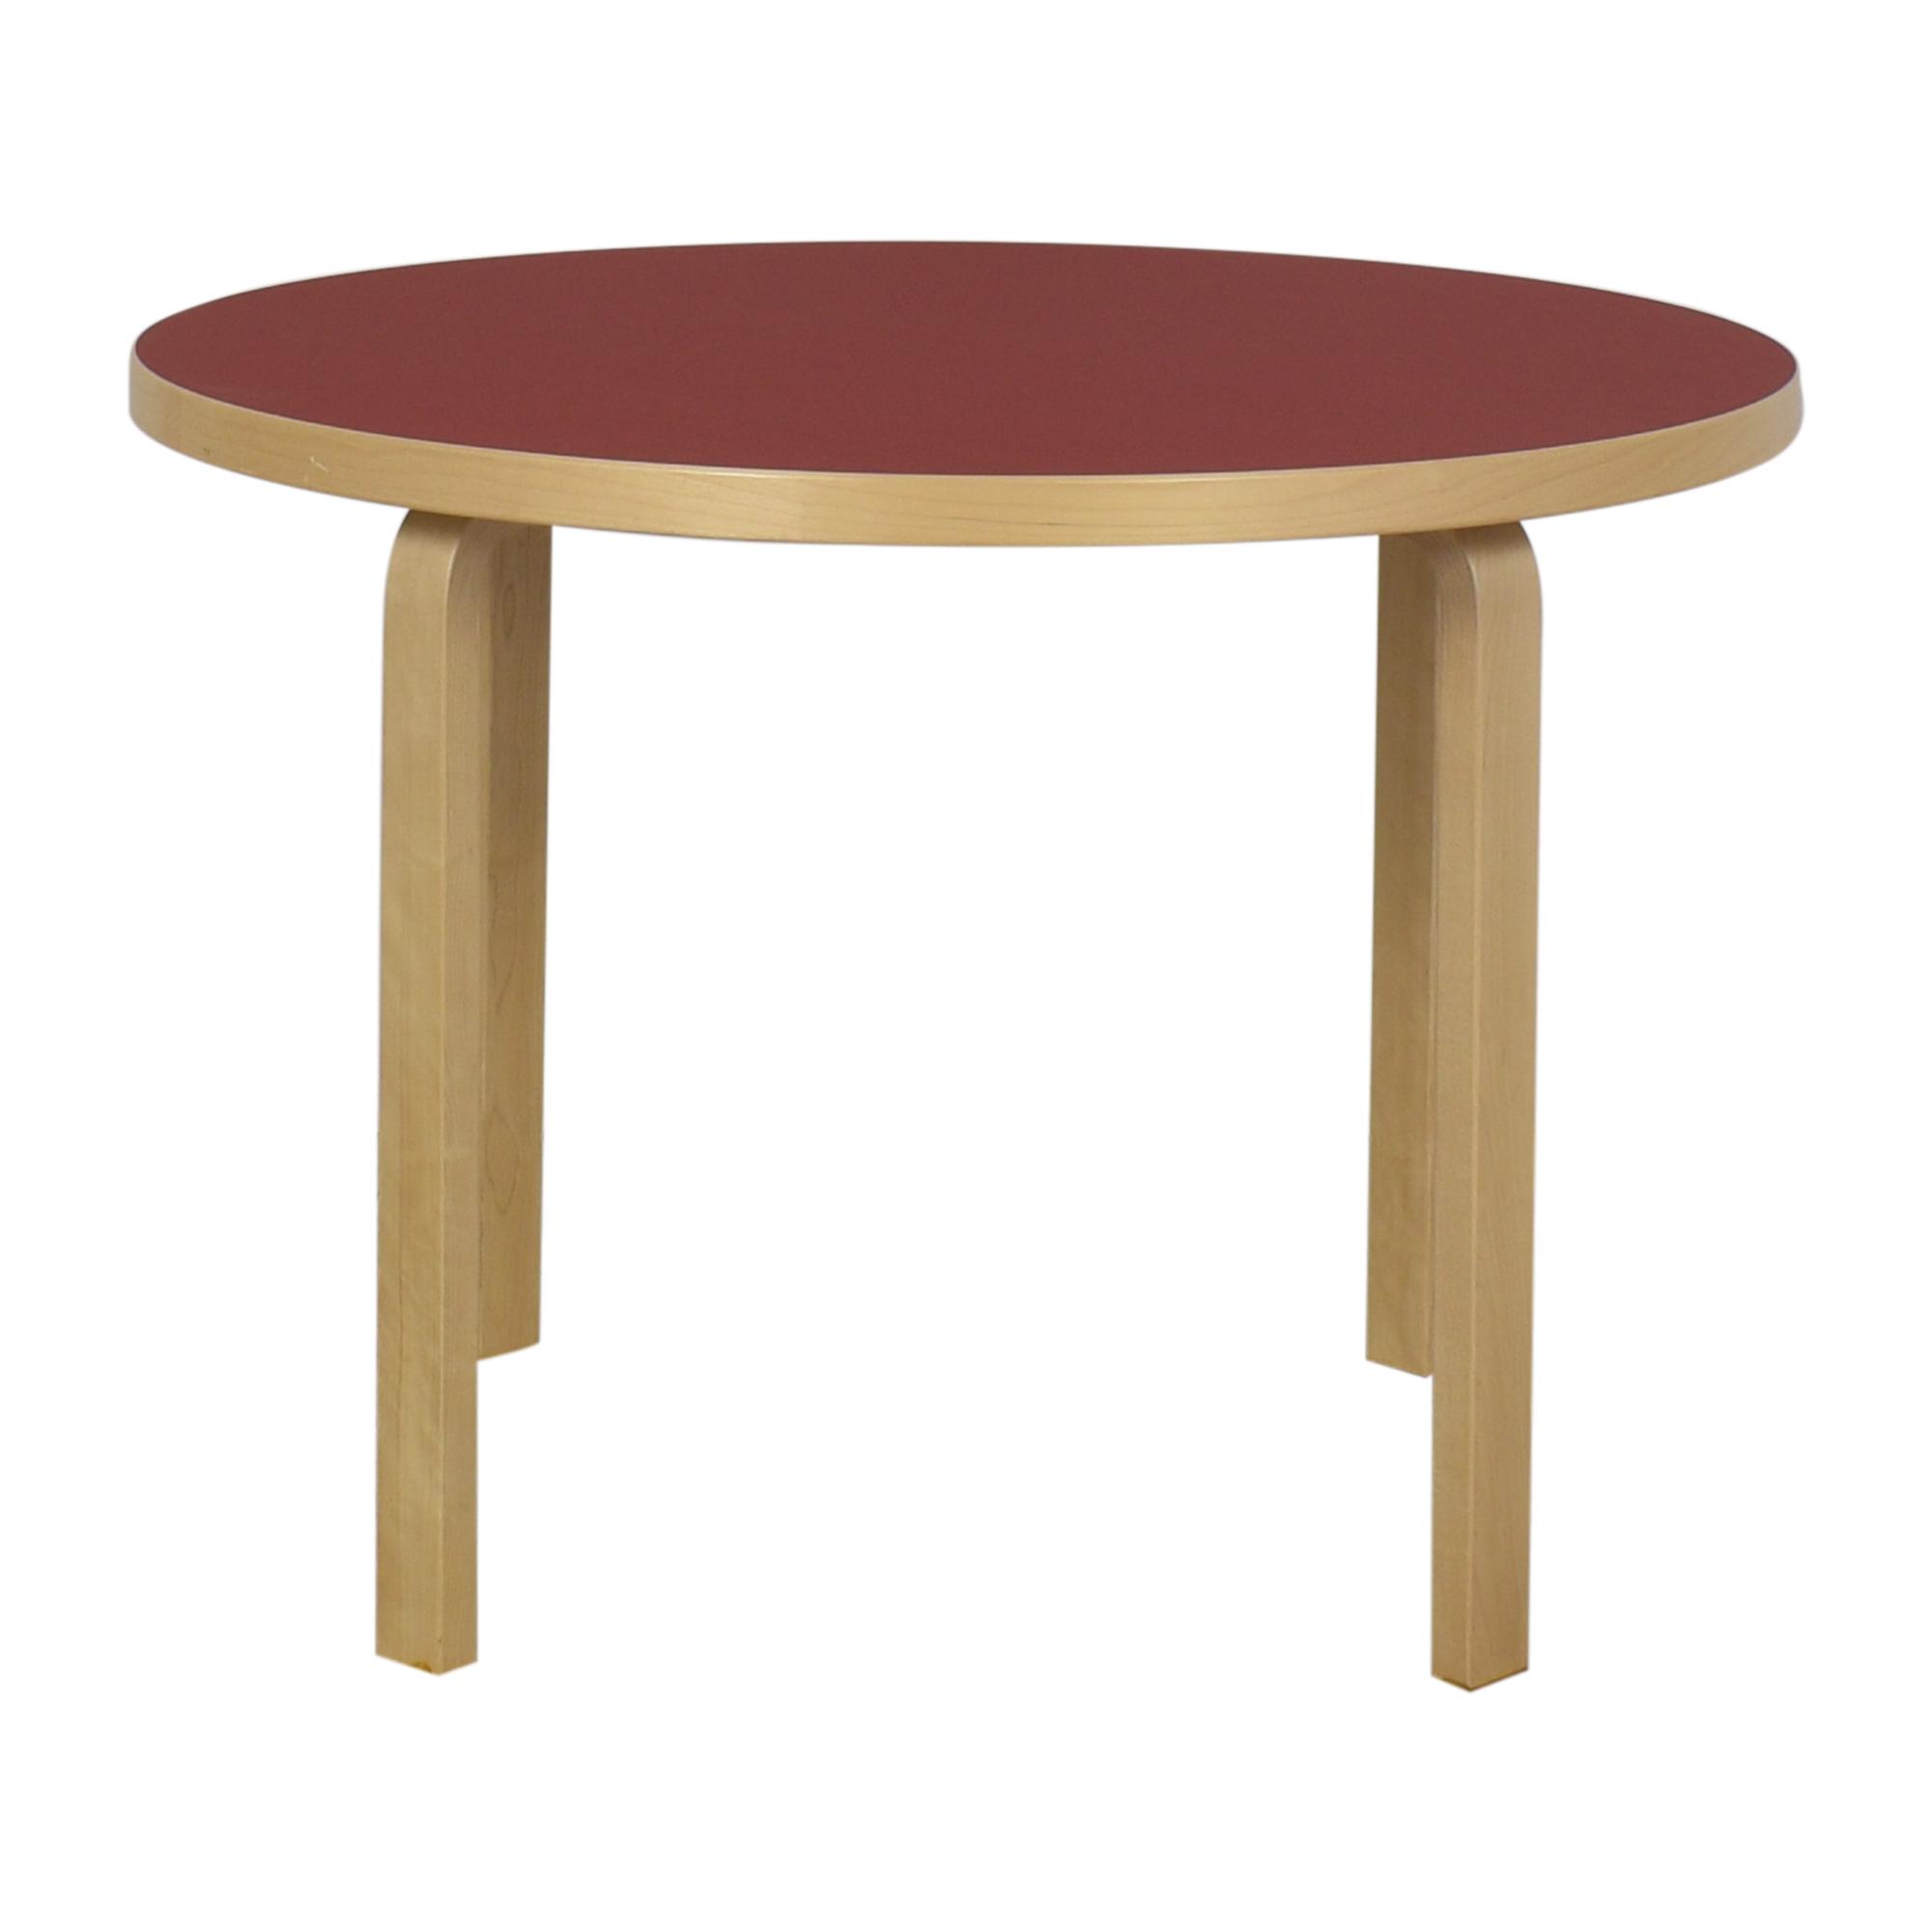 Artek Artek Alvar Aalto Table 90a discount